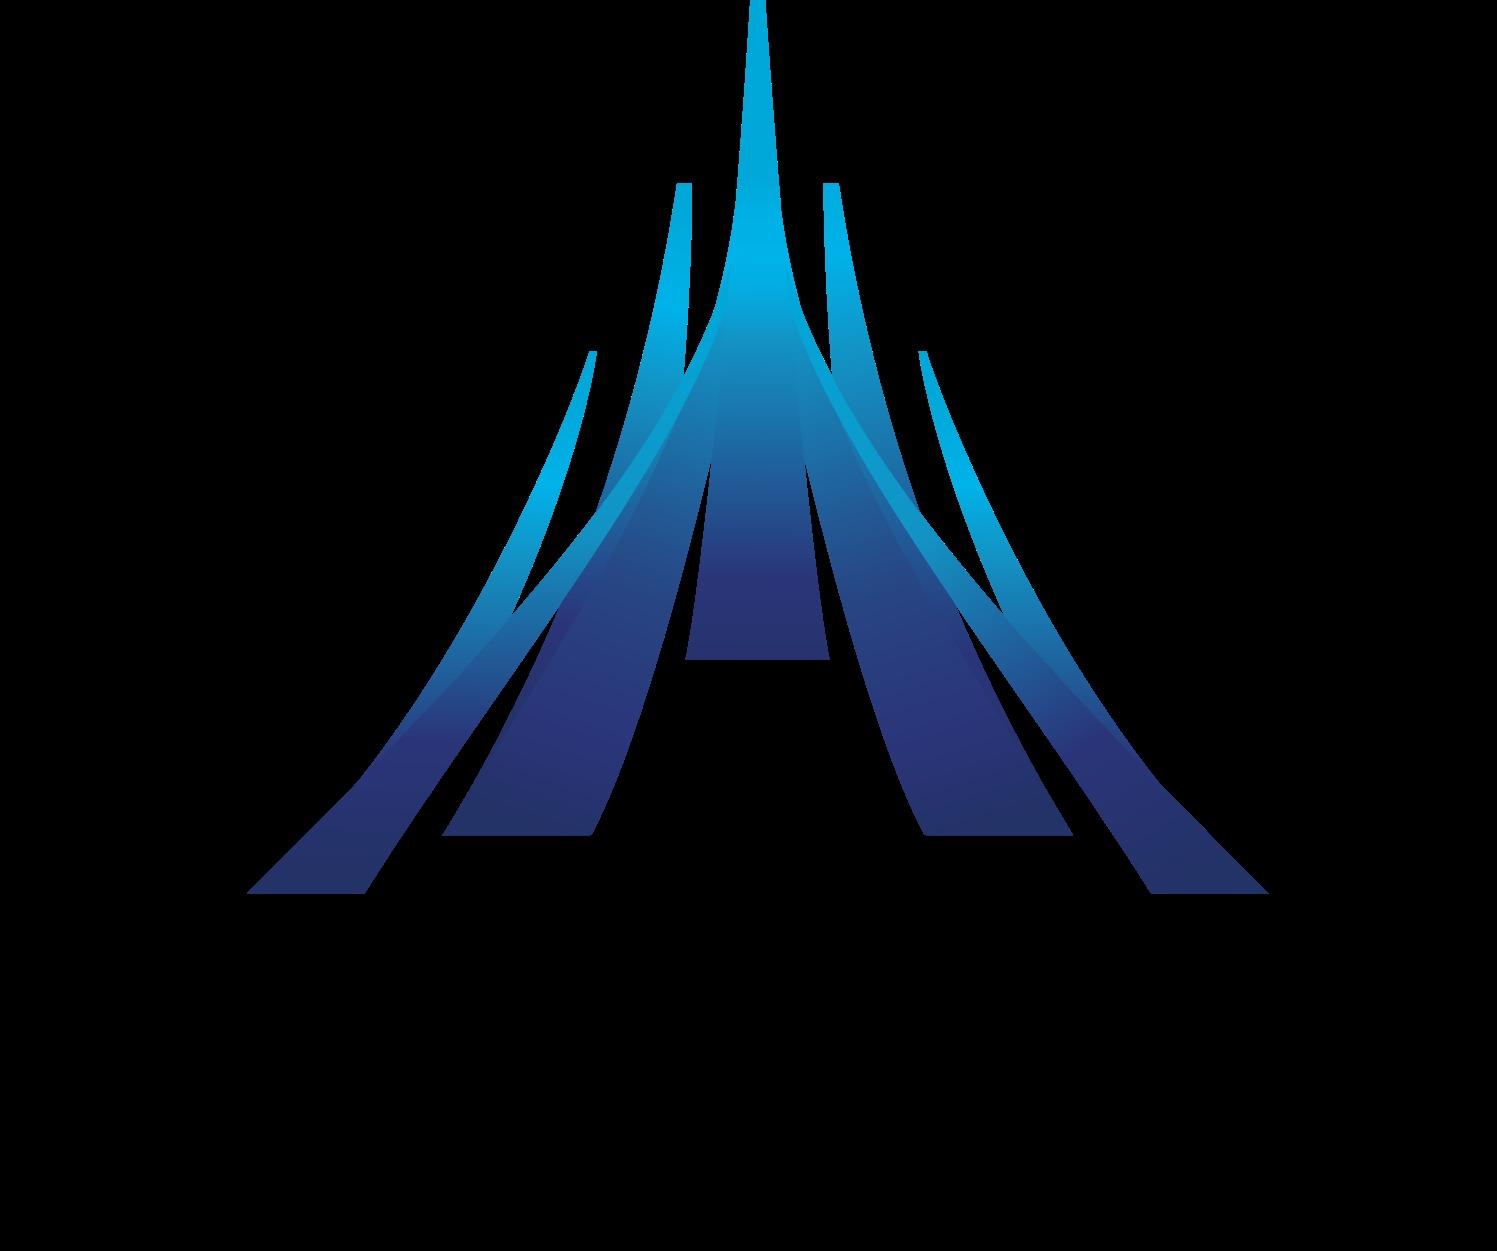 <b>《使命召唤》《死亡空间》主创人员创立Ascendant工作室</b>